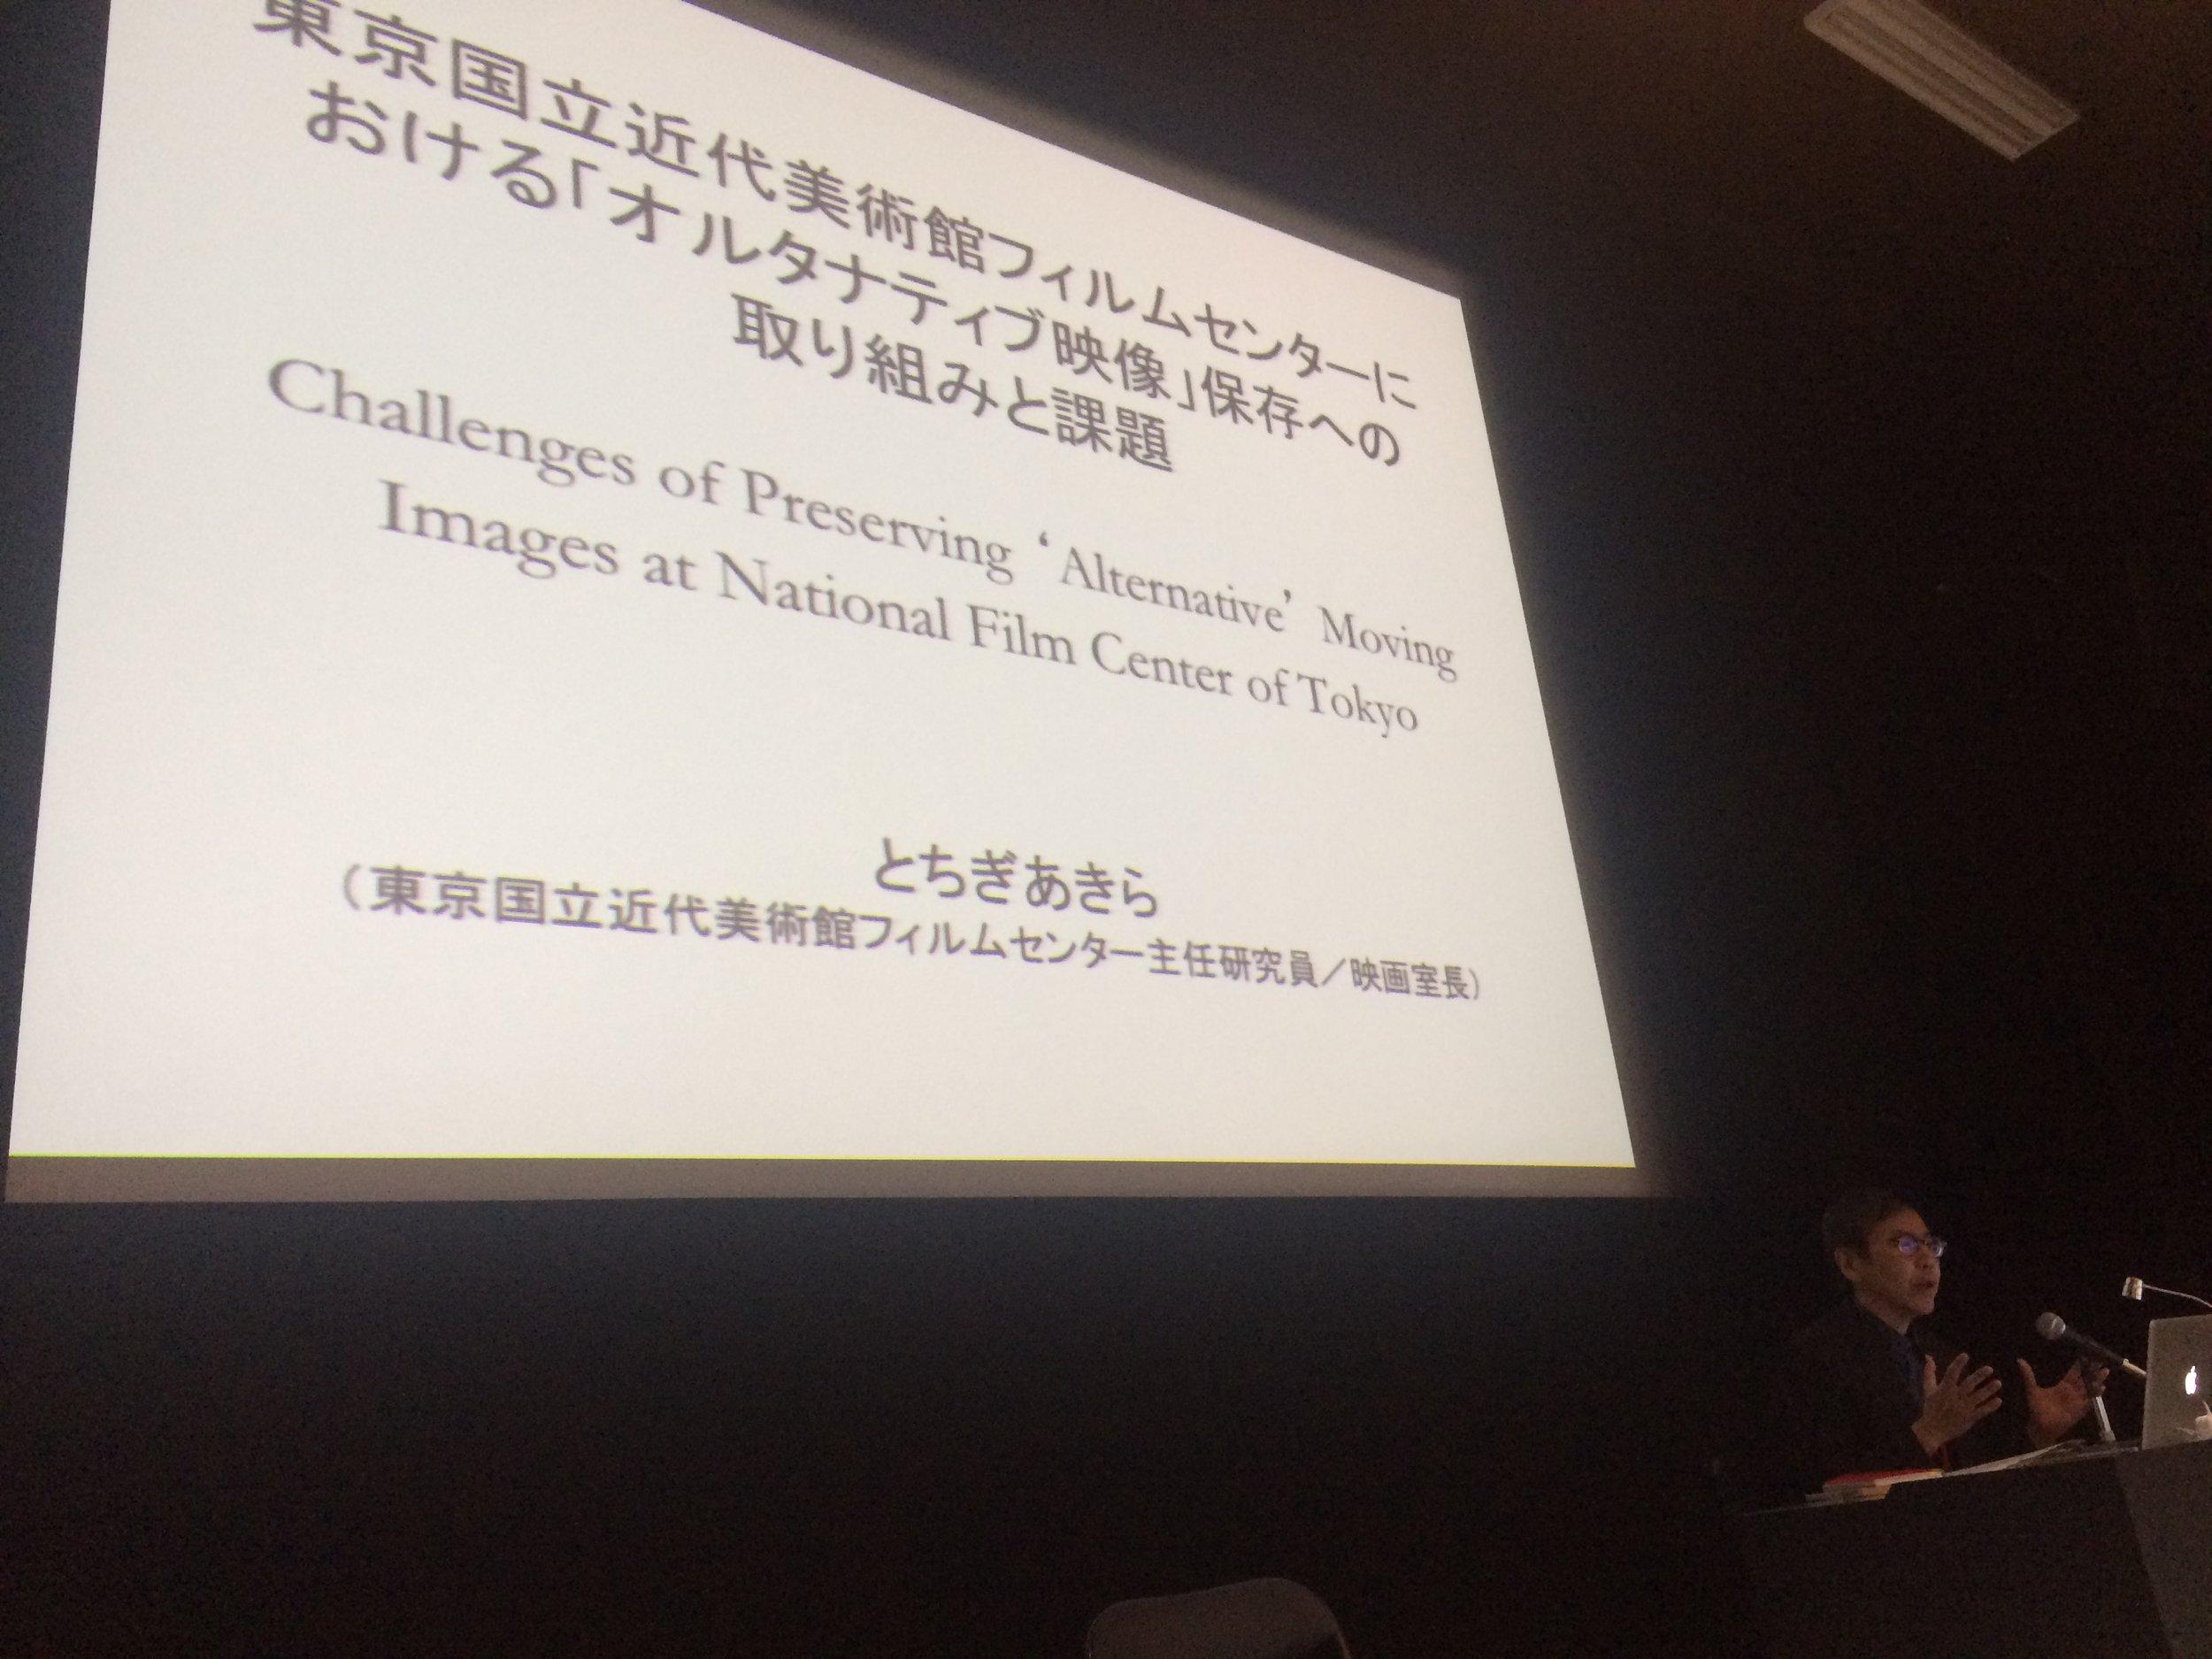 "Lecture: Akira Tochigi,""Challenges of Preserving ""Alternative"" Moving Images at National Film Center Tokyo""     レクチャー :とちぎあきら「東京国立美術館フィルムセンターにおける「オルタナティブ映像」保存への取り組みと課題」"